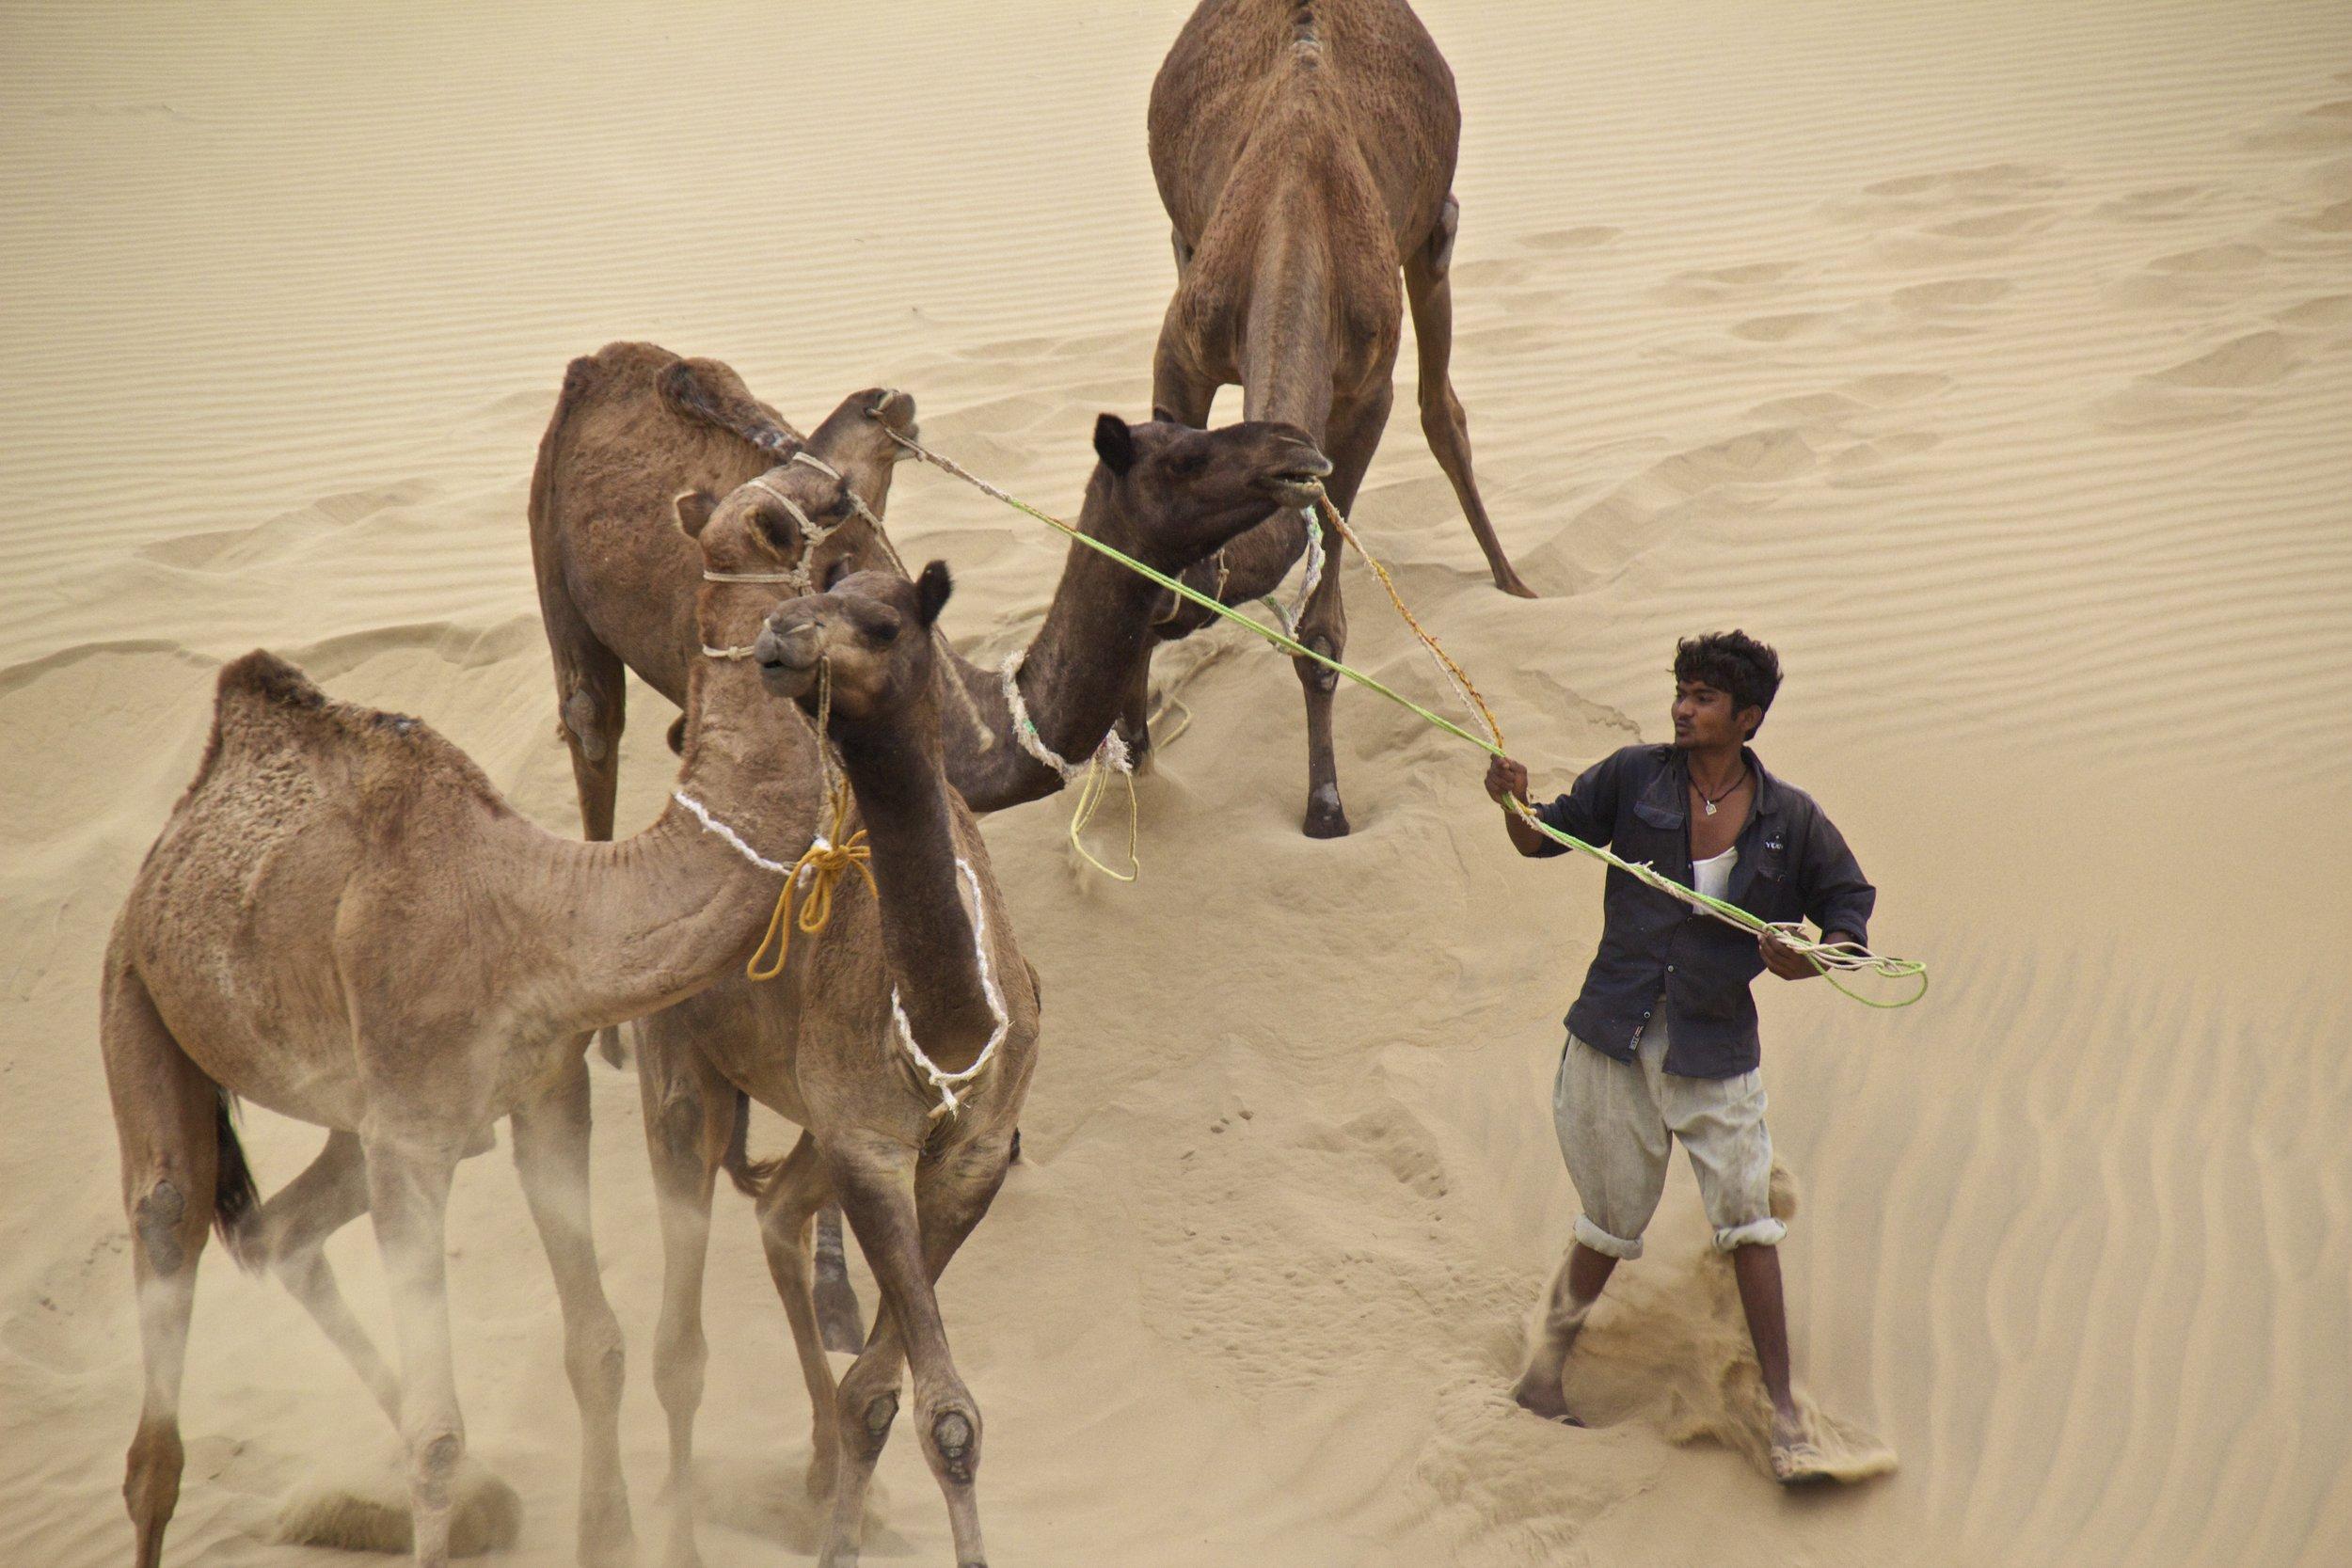 thar desert rajasthan camel safari 5.jpg